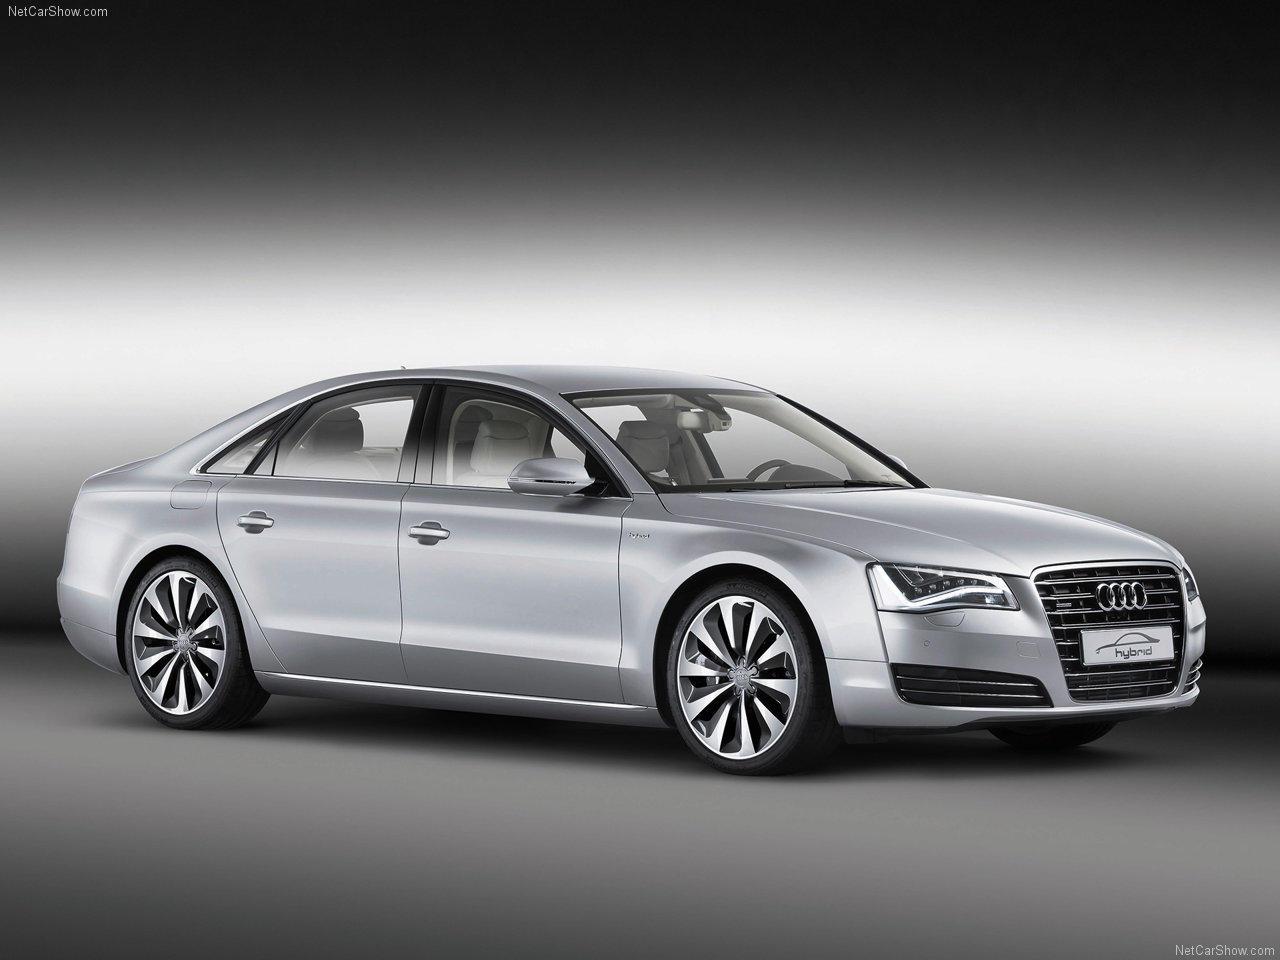 Audi-A8_Hybrid_Concept_2010_1280x960_wallpaper_02